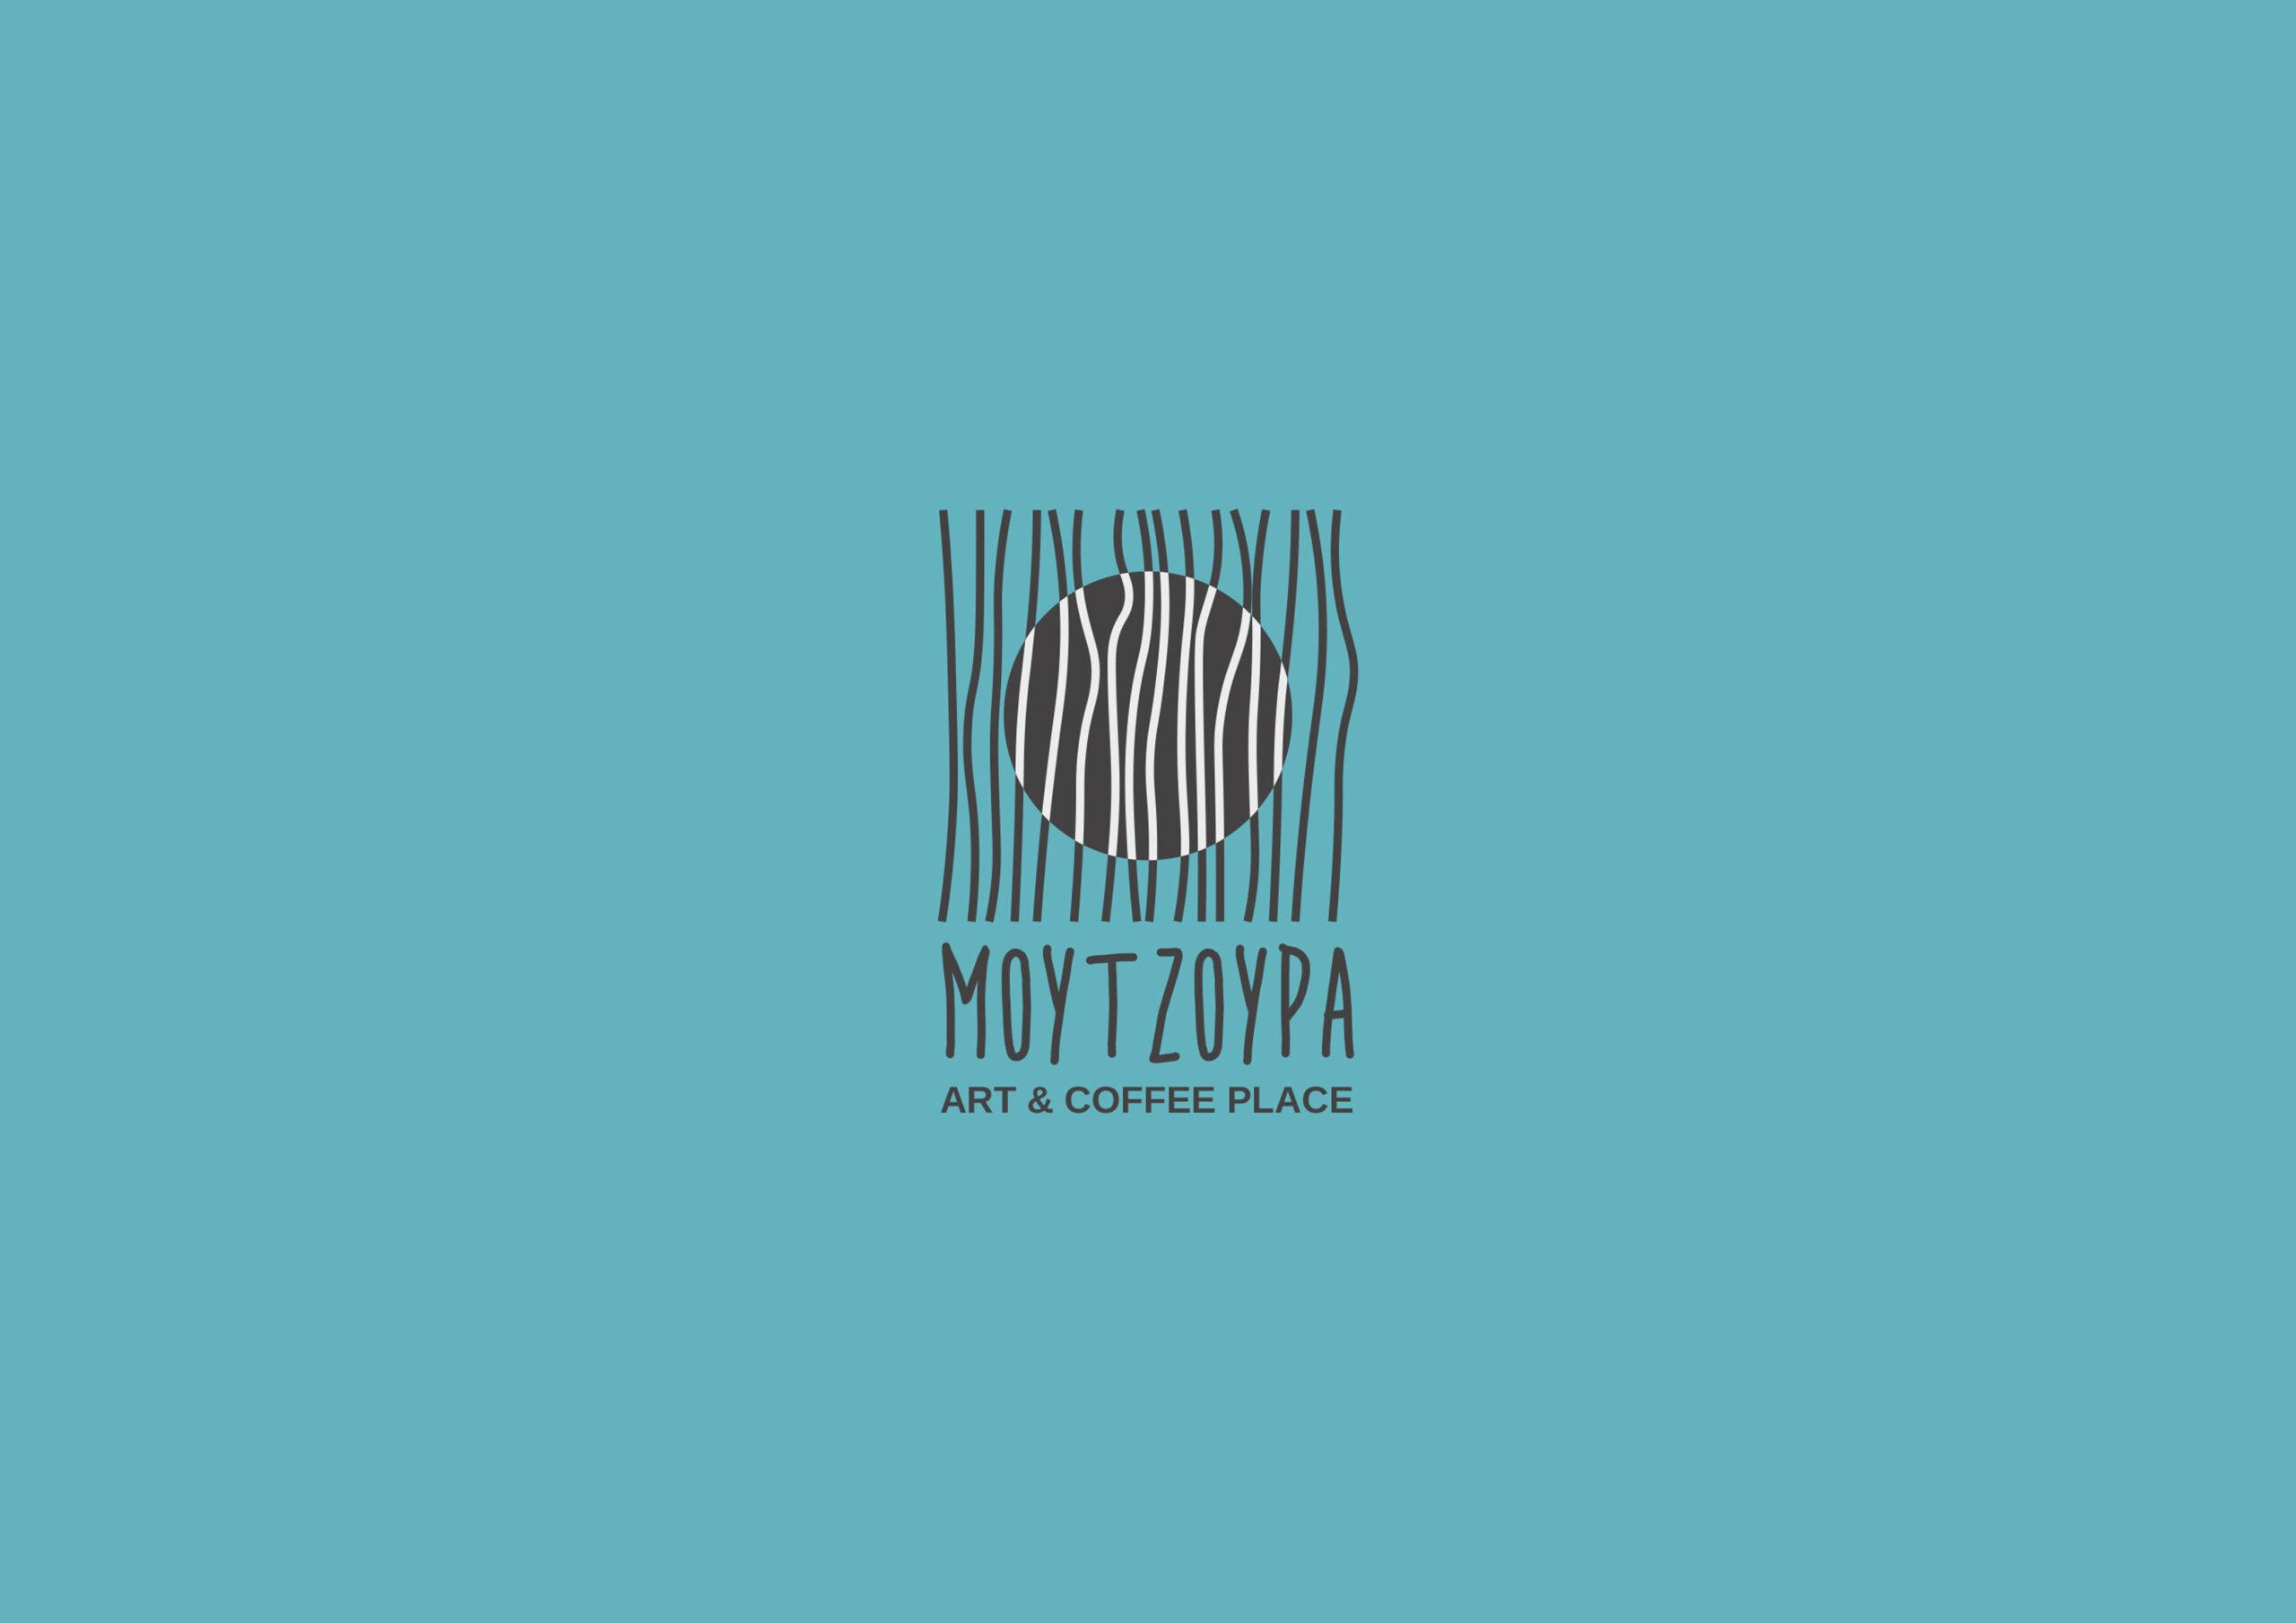 mountzoura6